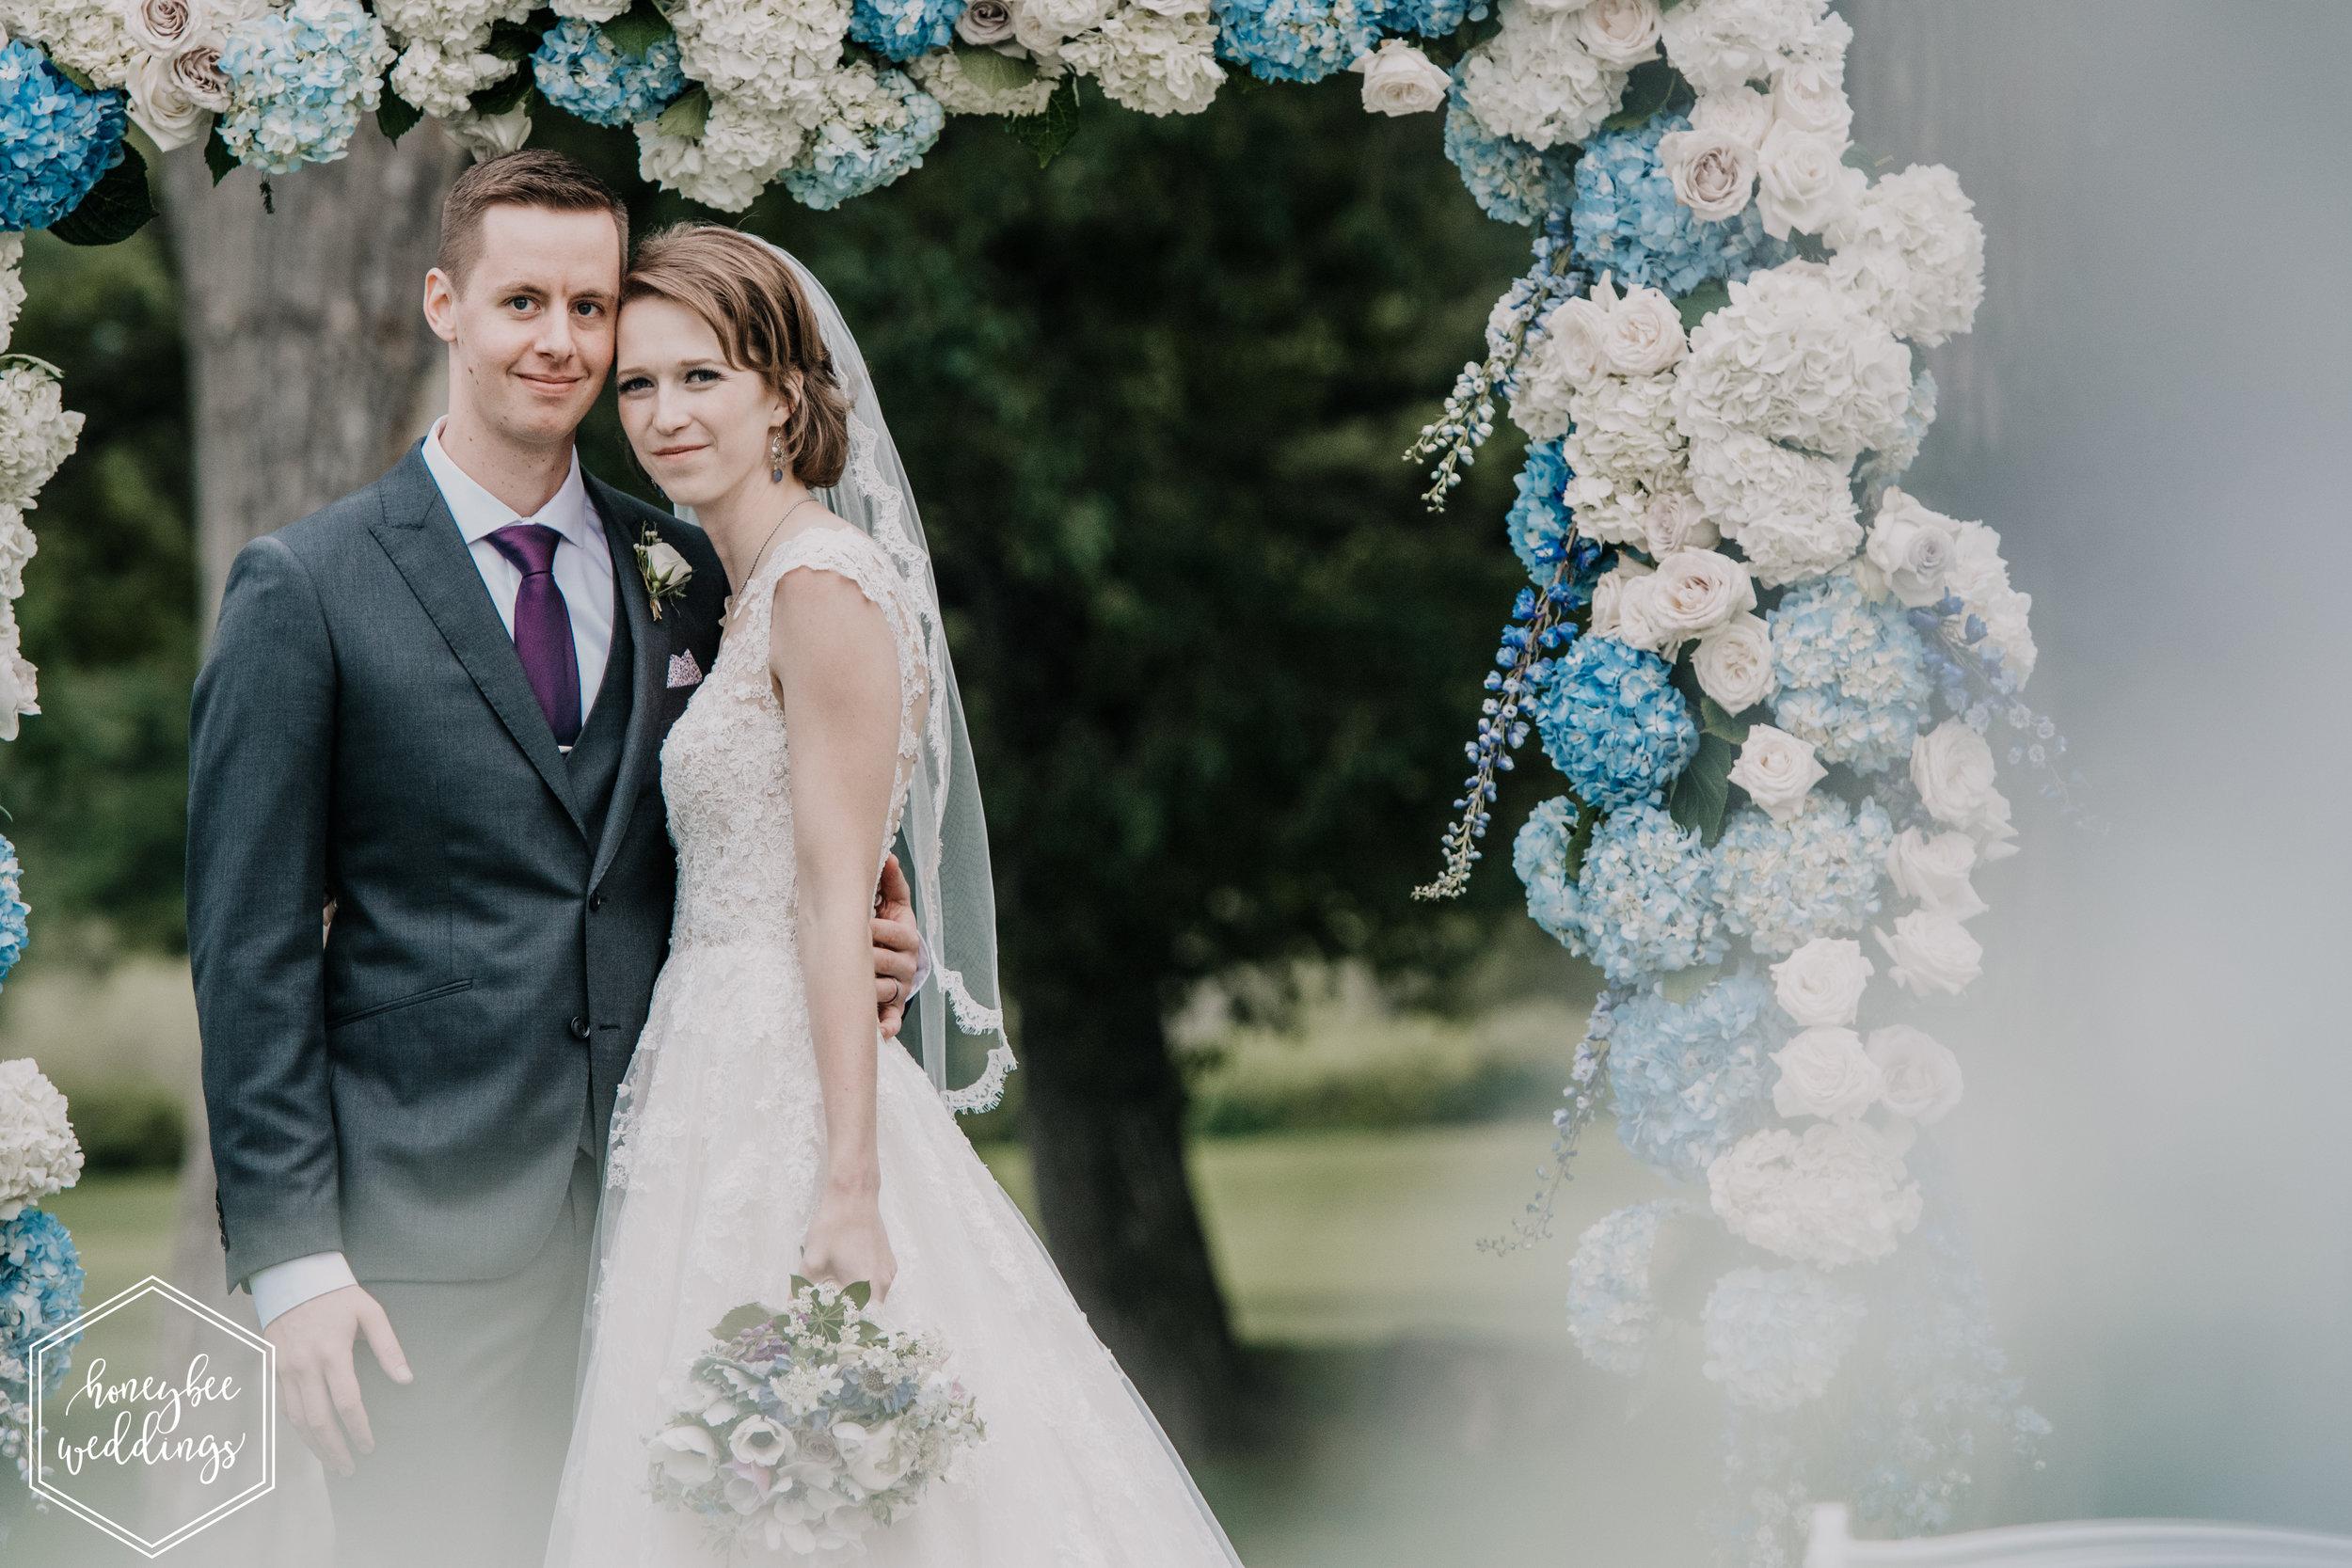 870 Riverside Country Club Wedding_Montana Wedding Photographer_Lauren Jackson + Evan Ivaldi 2018-7168.jpg